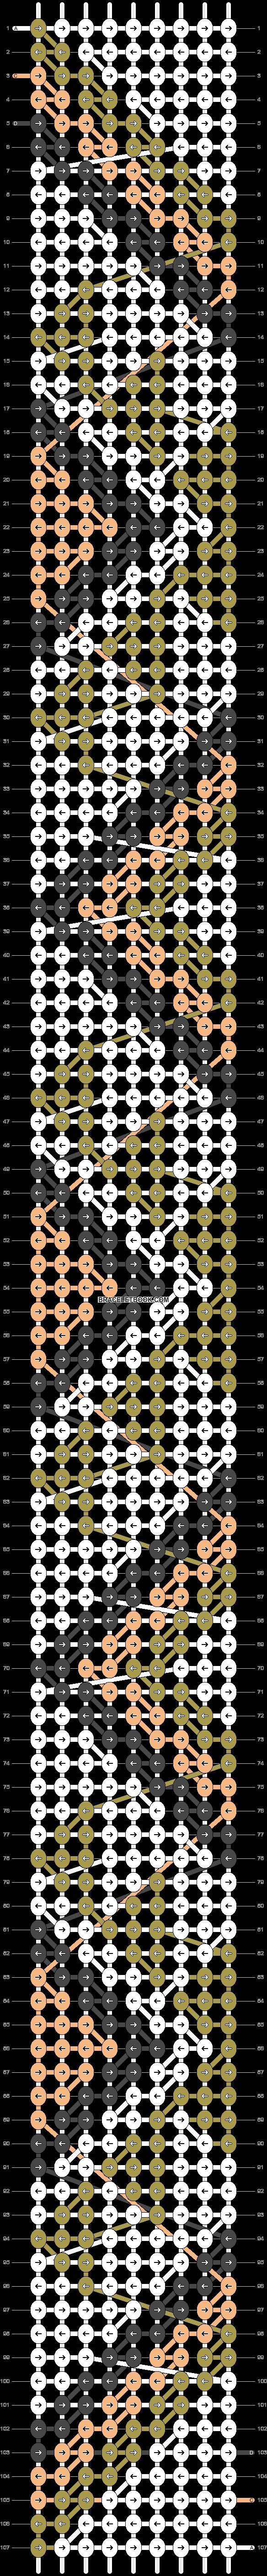 Alpha Pattern #21107 added by skorpiaa